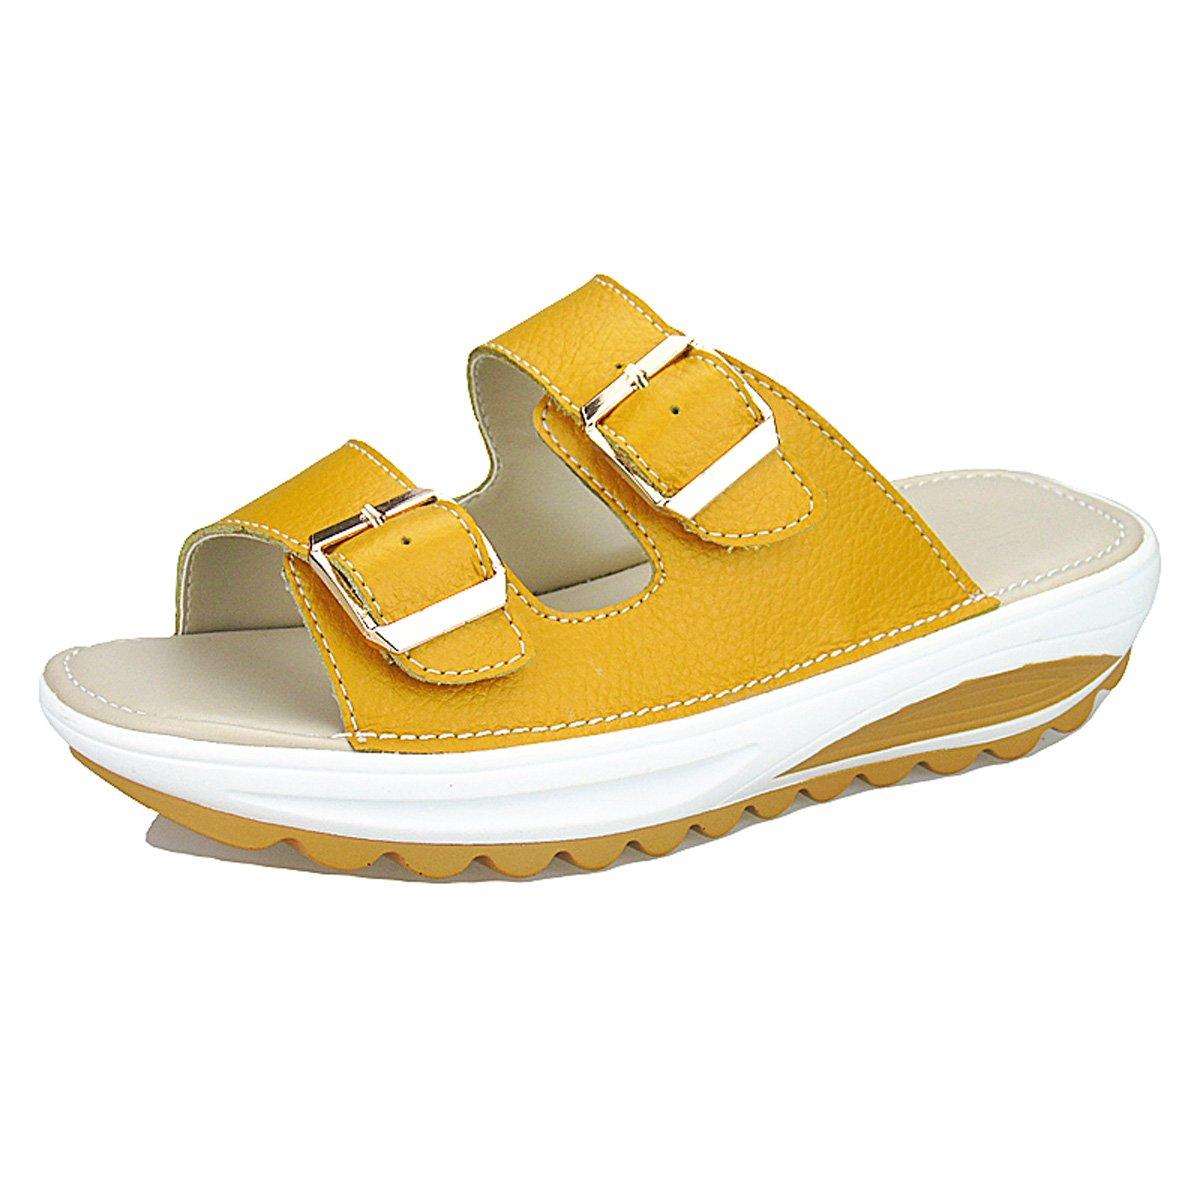 gracosy Damen Pantoletten, Leder Sandalen Zehentrenner Flip Flops Hausschuhe Sommer Strand Schuhe Espadrilles  39 EU|Gelb